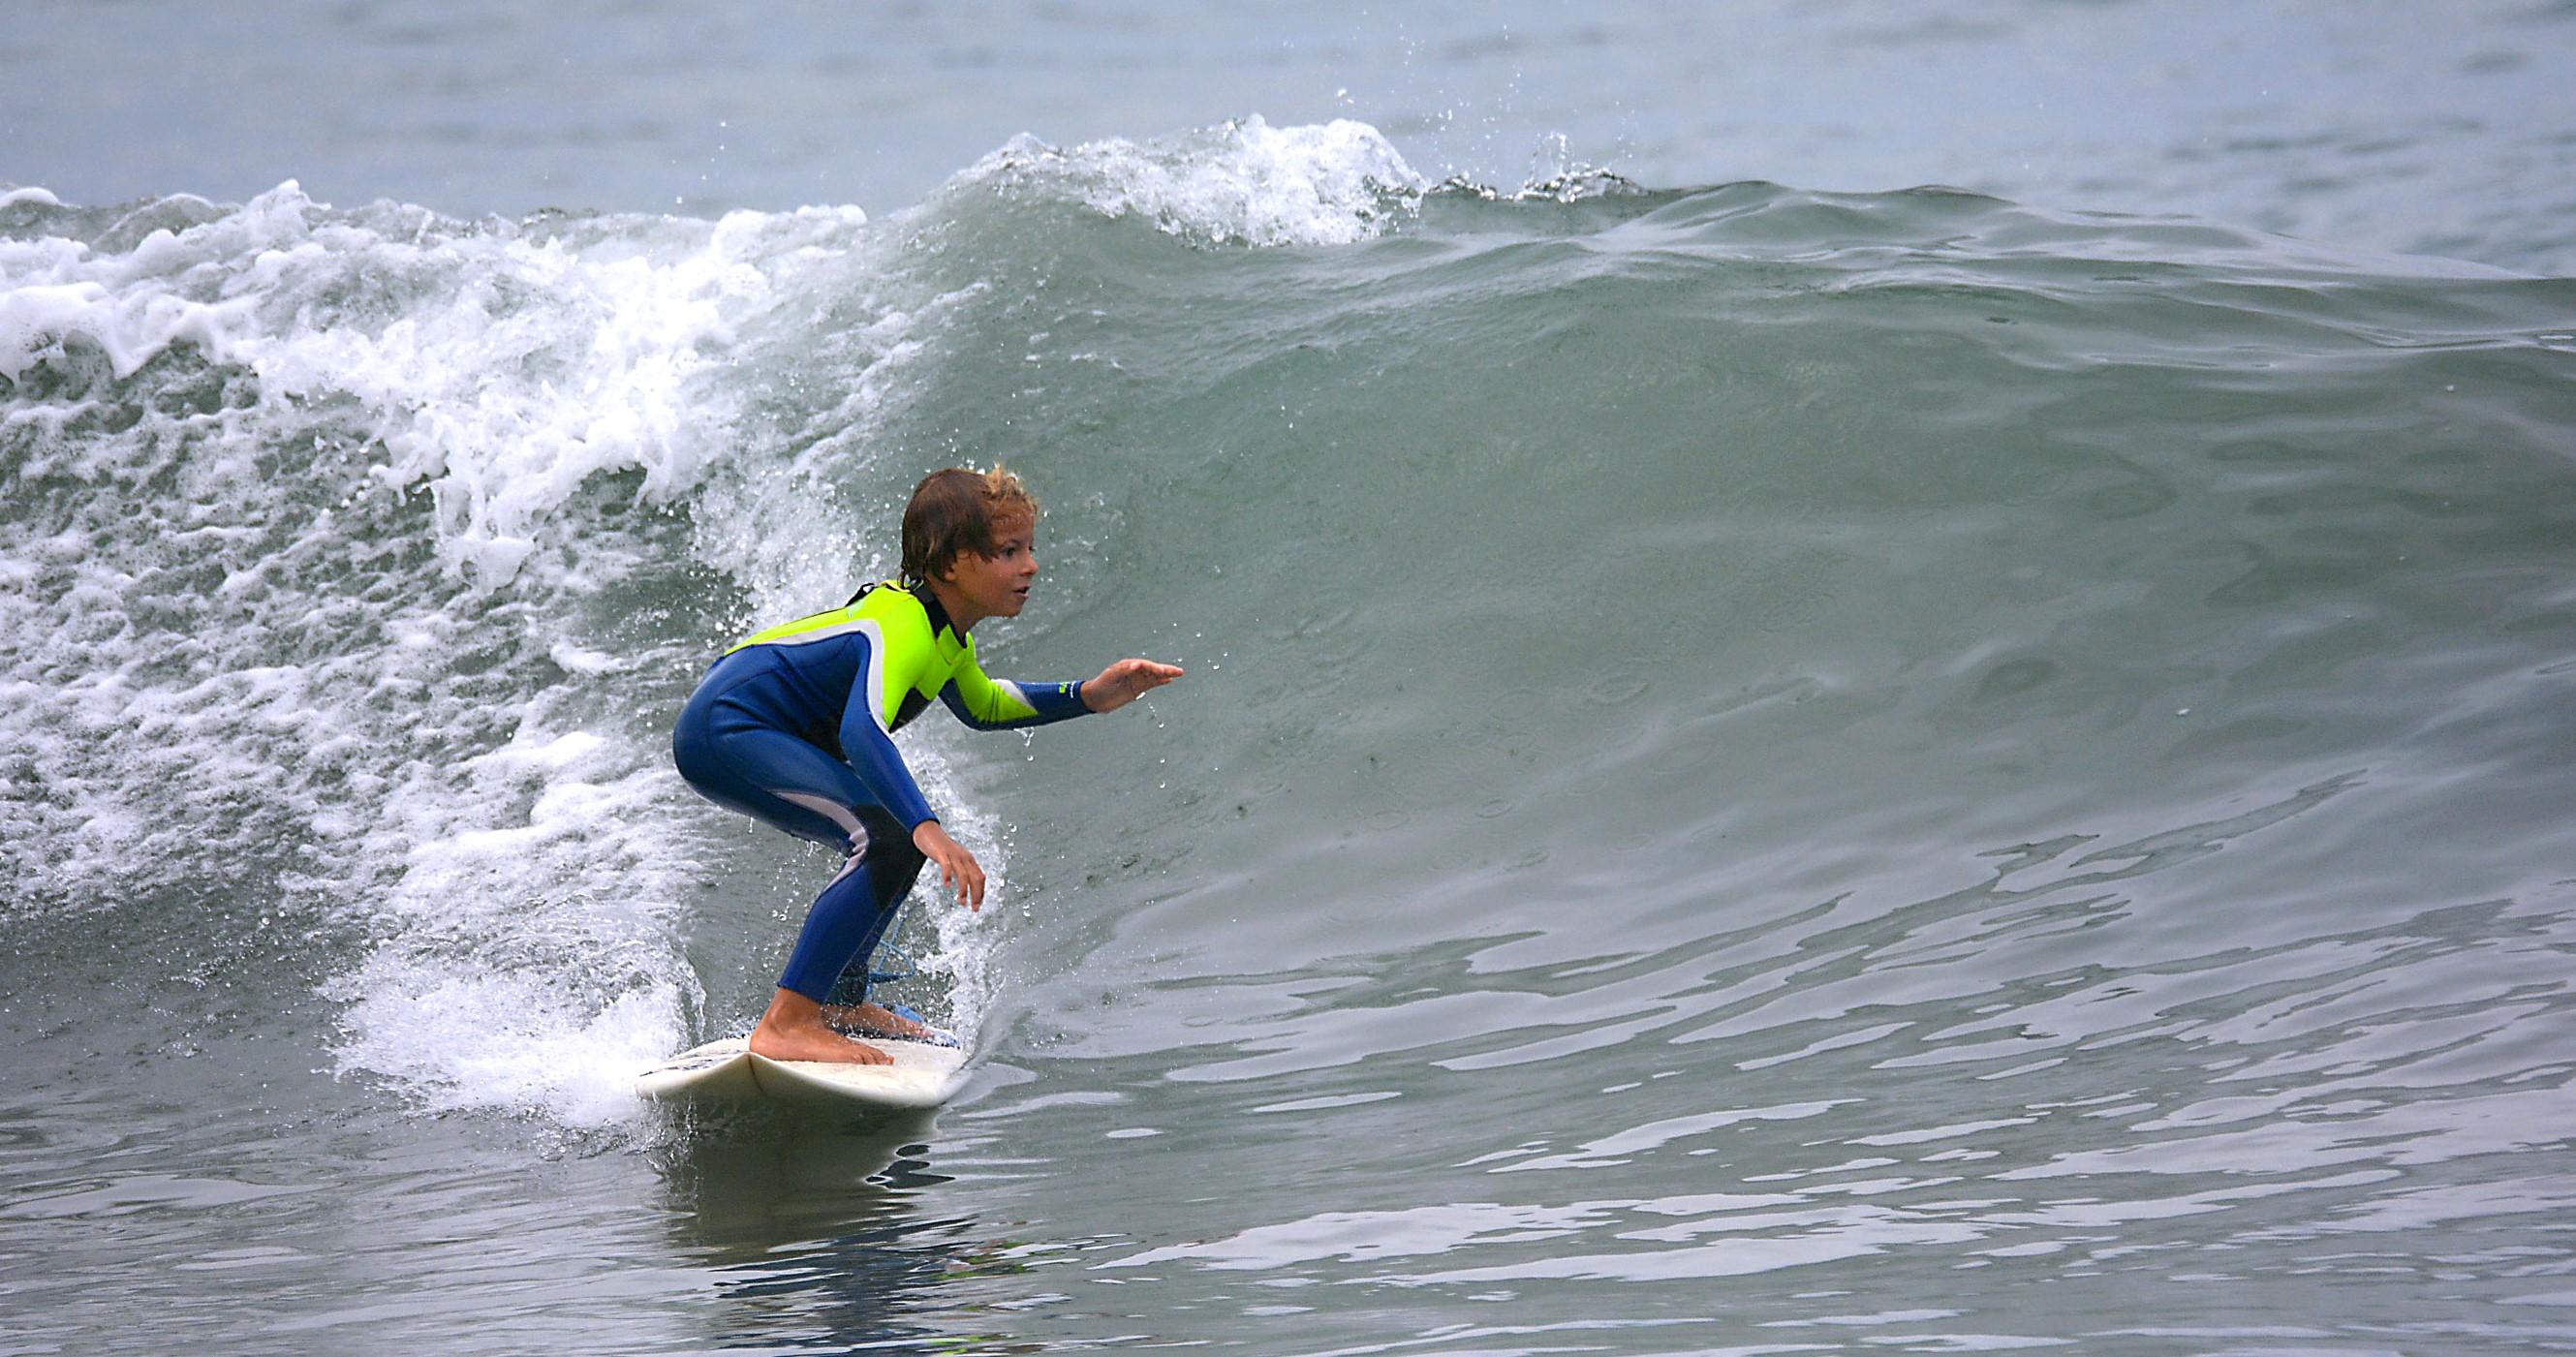 Nolan Senn, 8, surfs during the  Photo: Courtesy of AJ McClintick